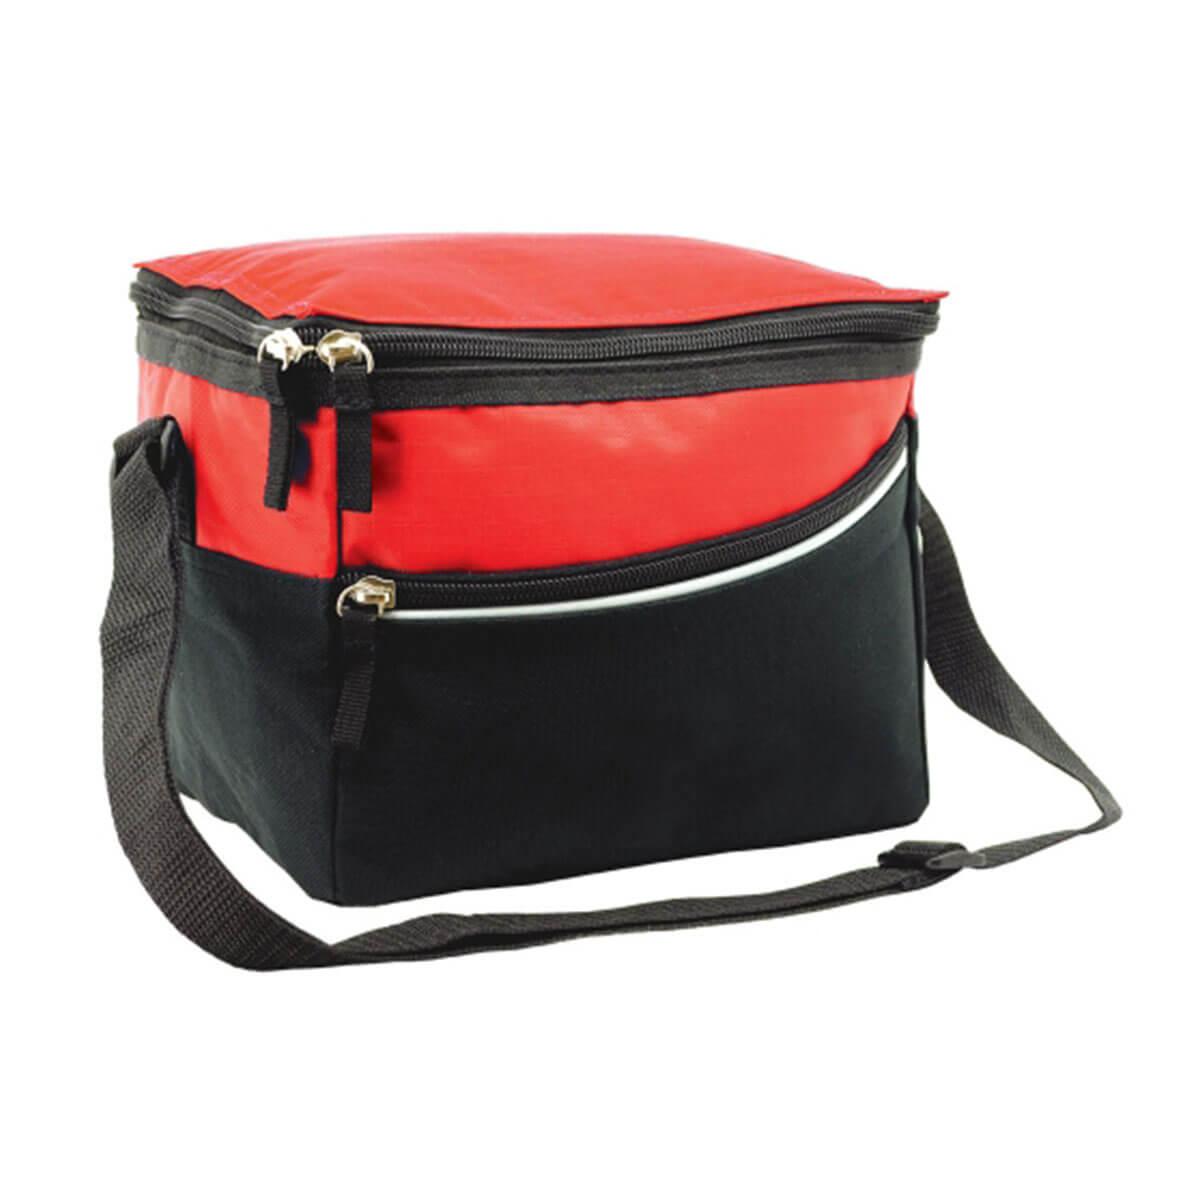 Amigo cooler bag-Red / Grey / Black